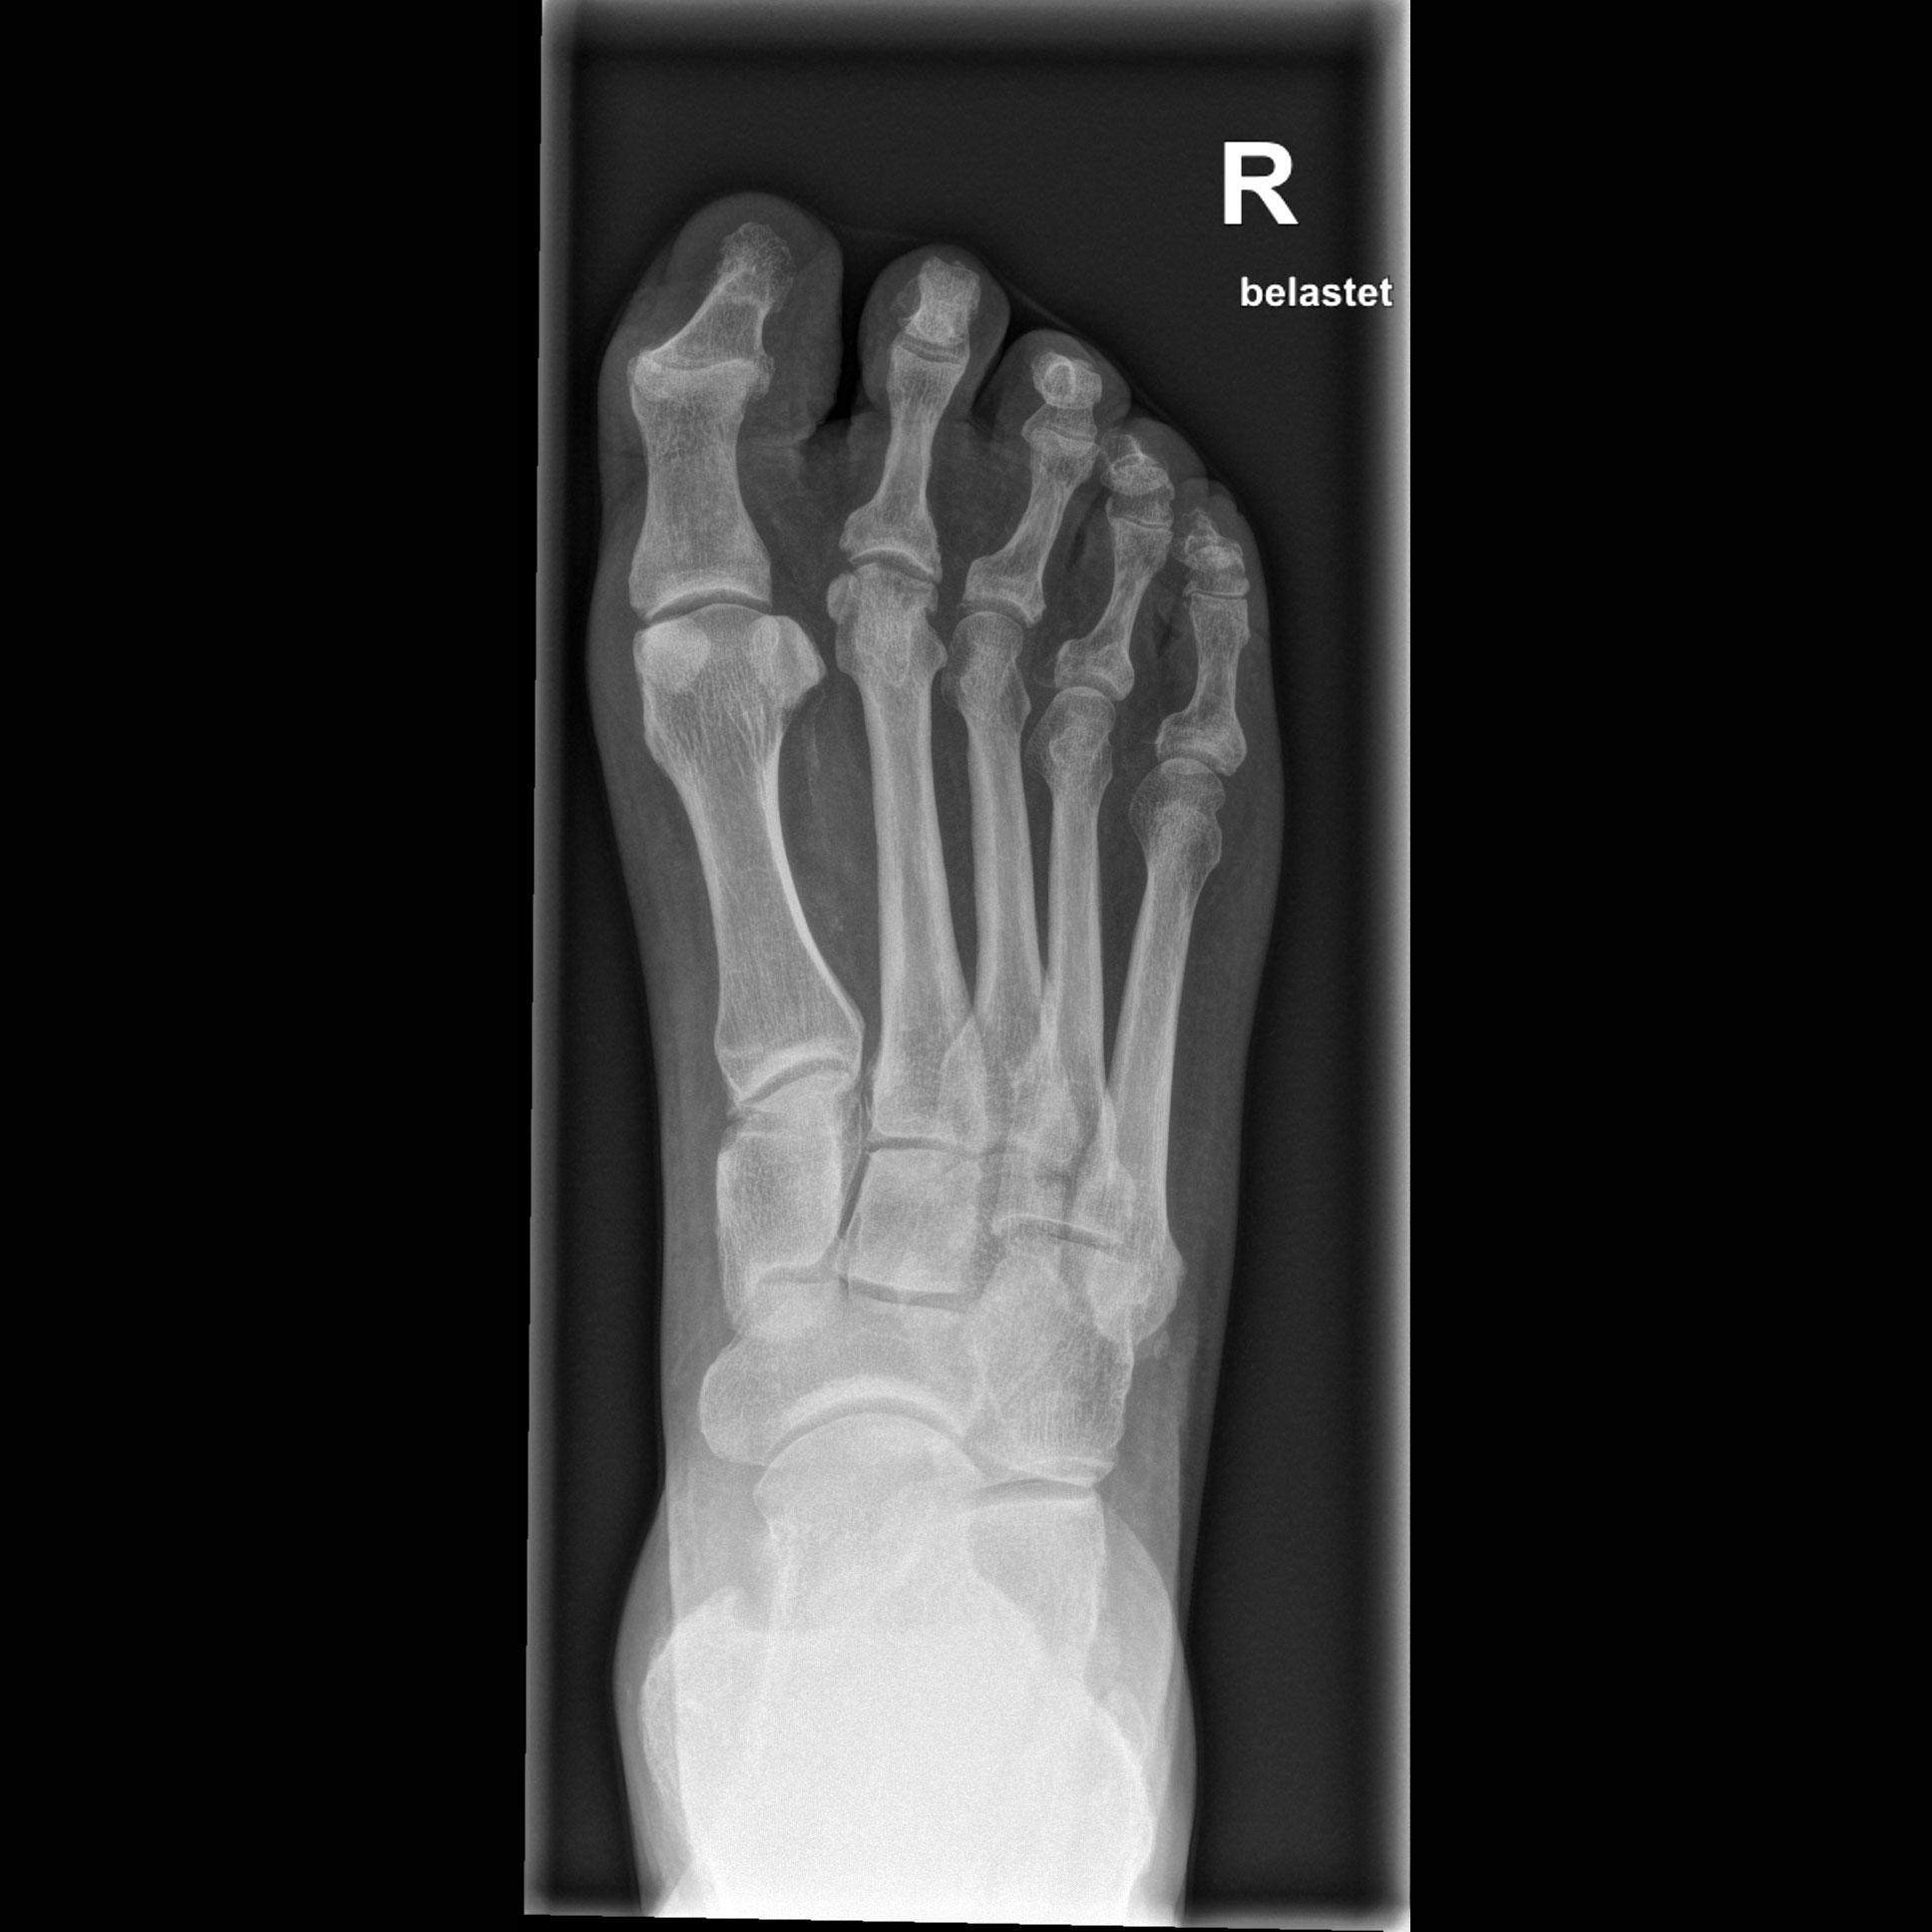 Mobilett Mira Max Foot III d.v. standing Image